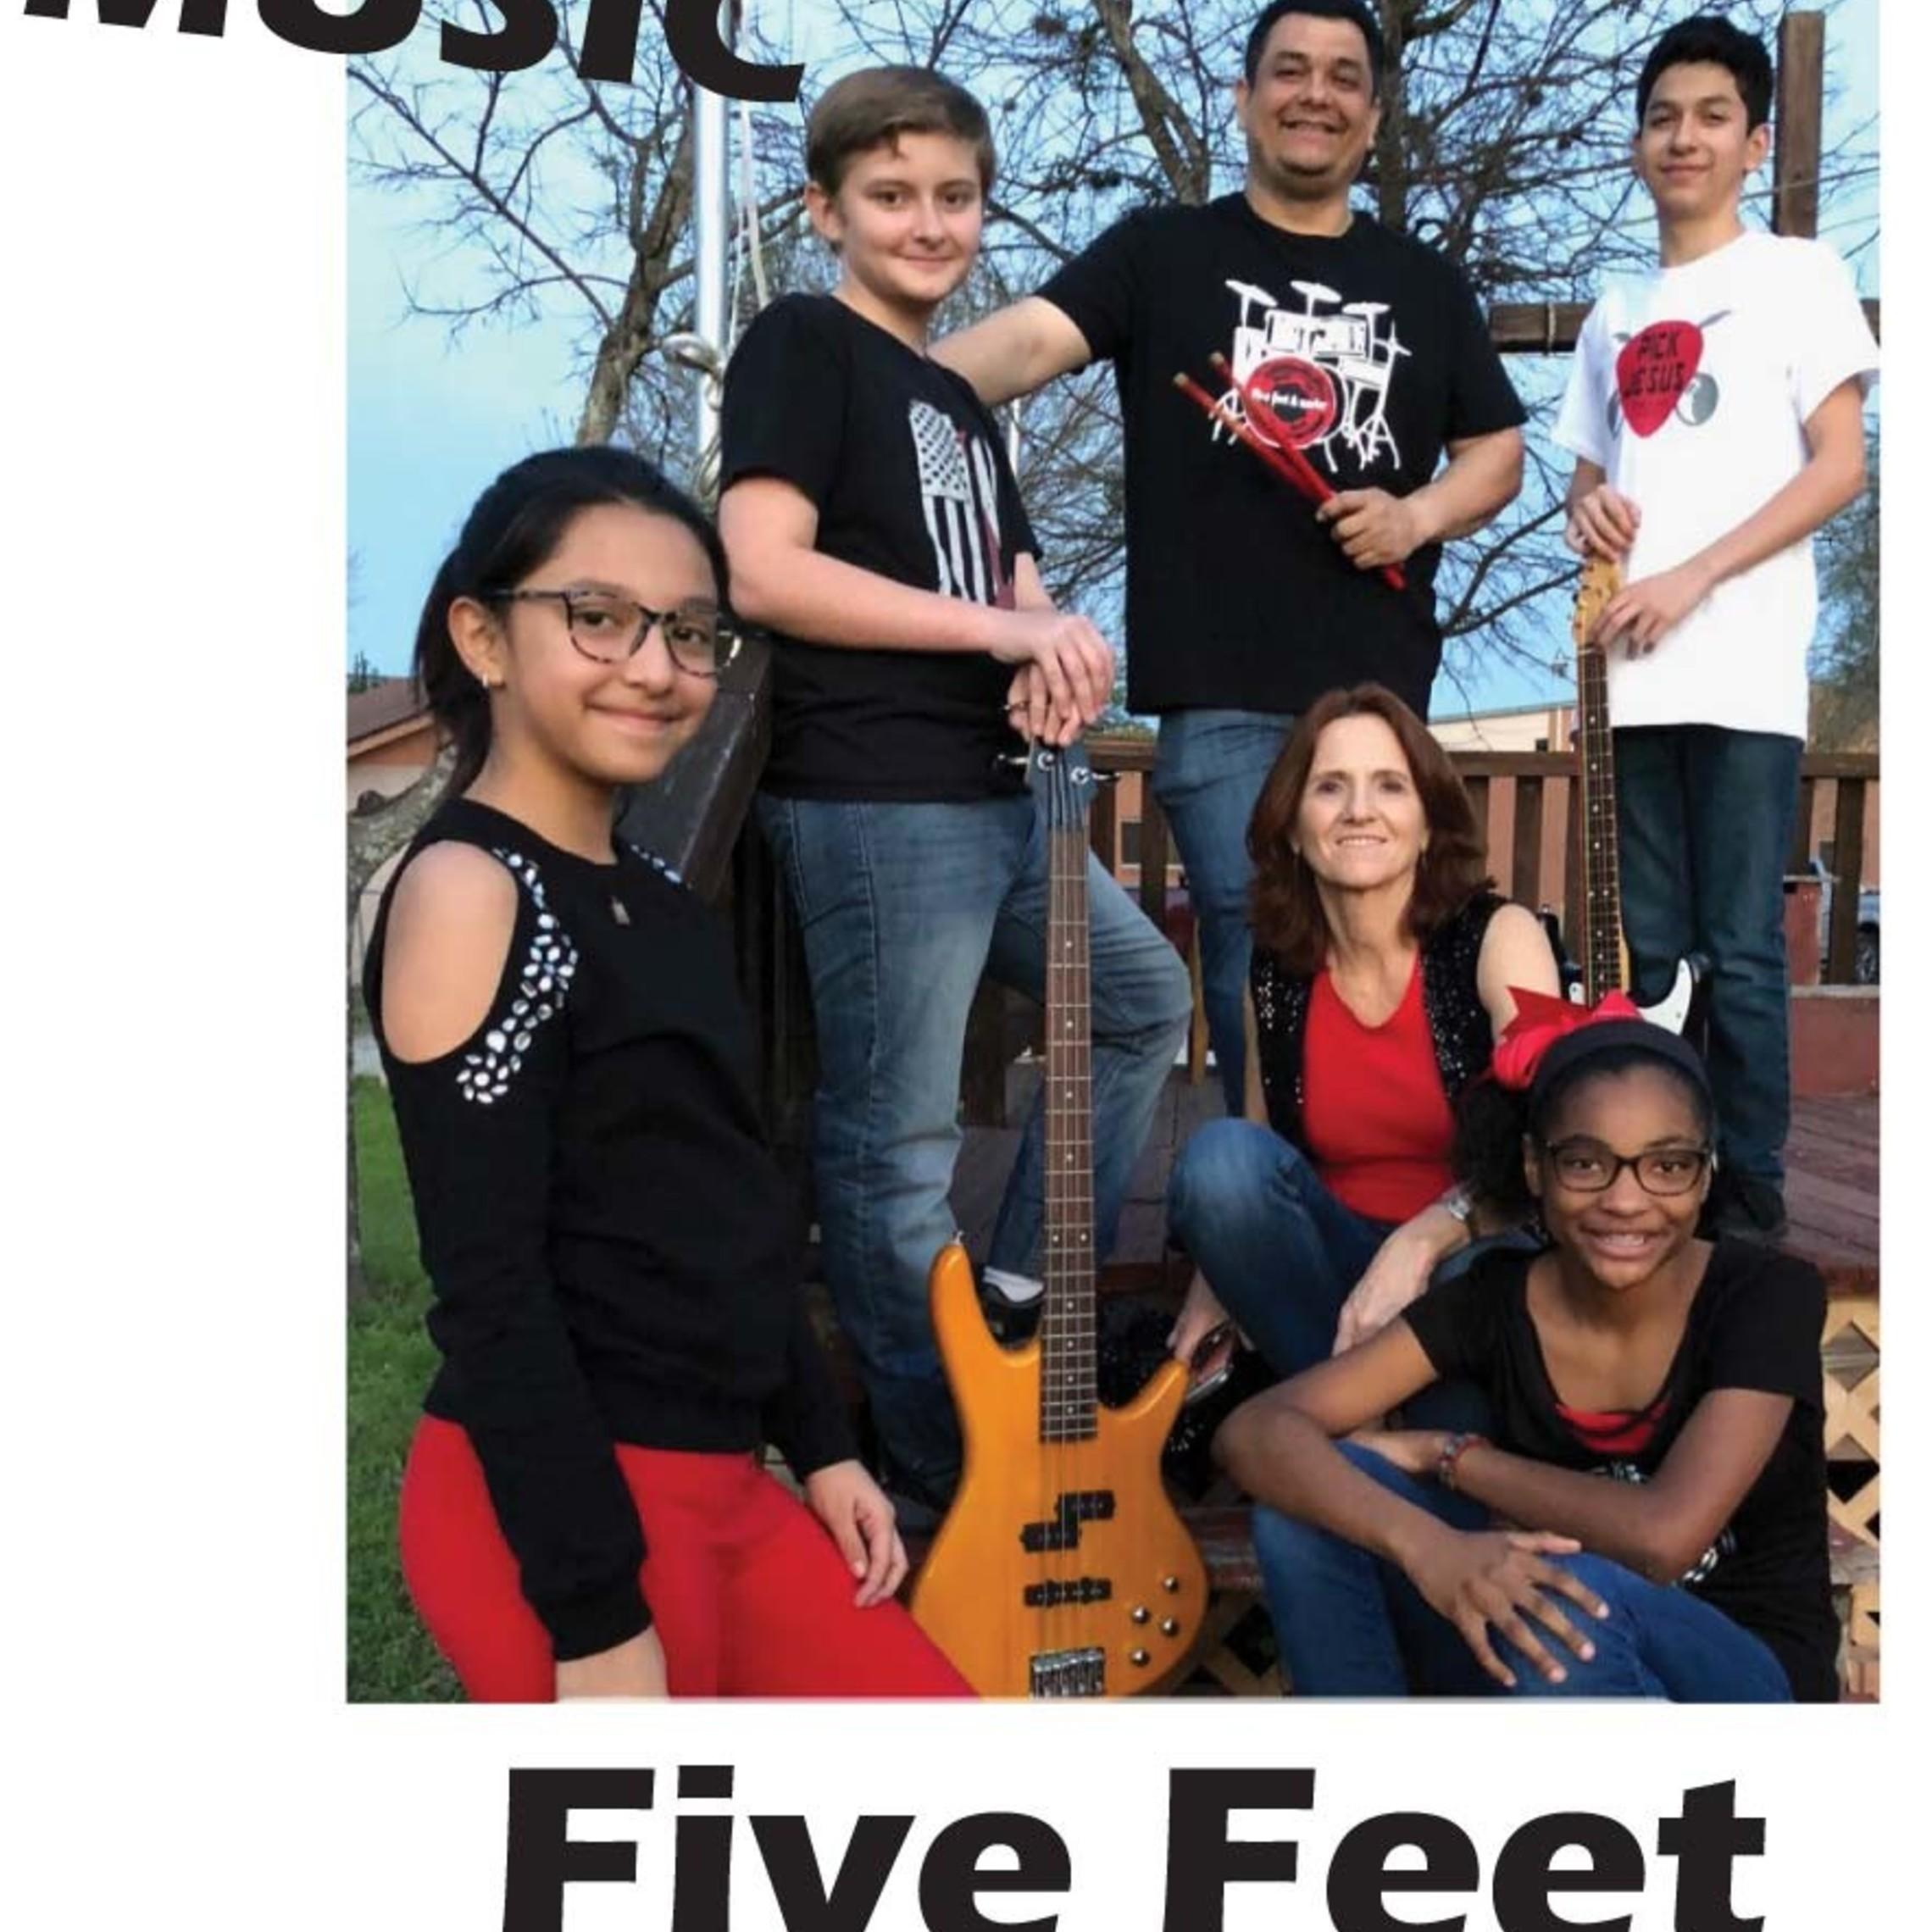 Five Feetunder